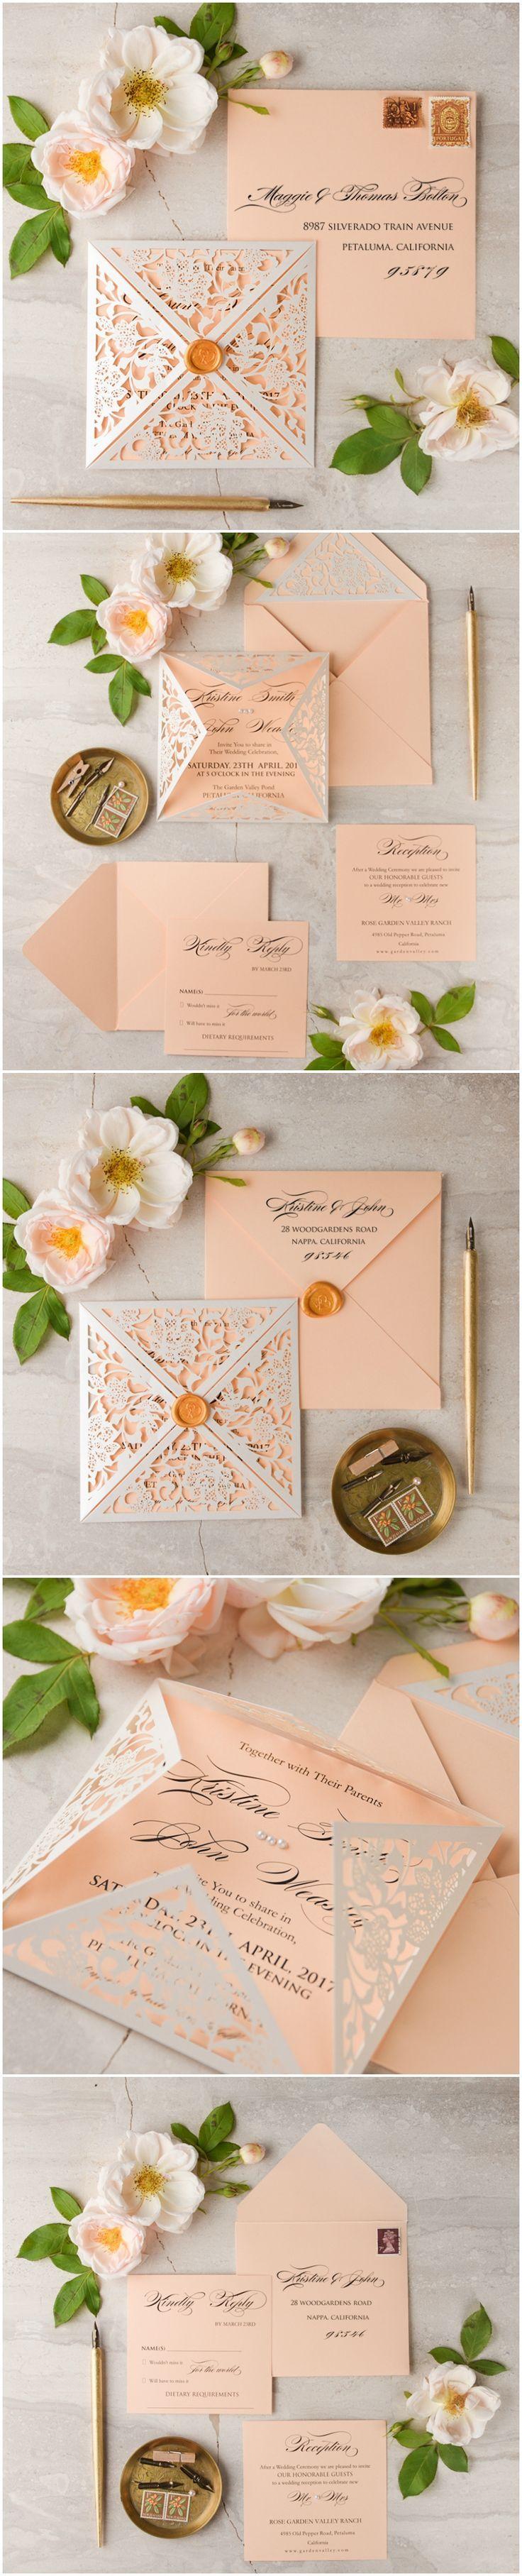 print yourself wedding invitations kit%0A Peach Laser cut Wedding Invitation  calligraphy printing  wax stamping   peach  blush